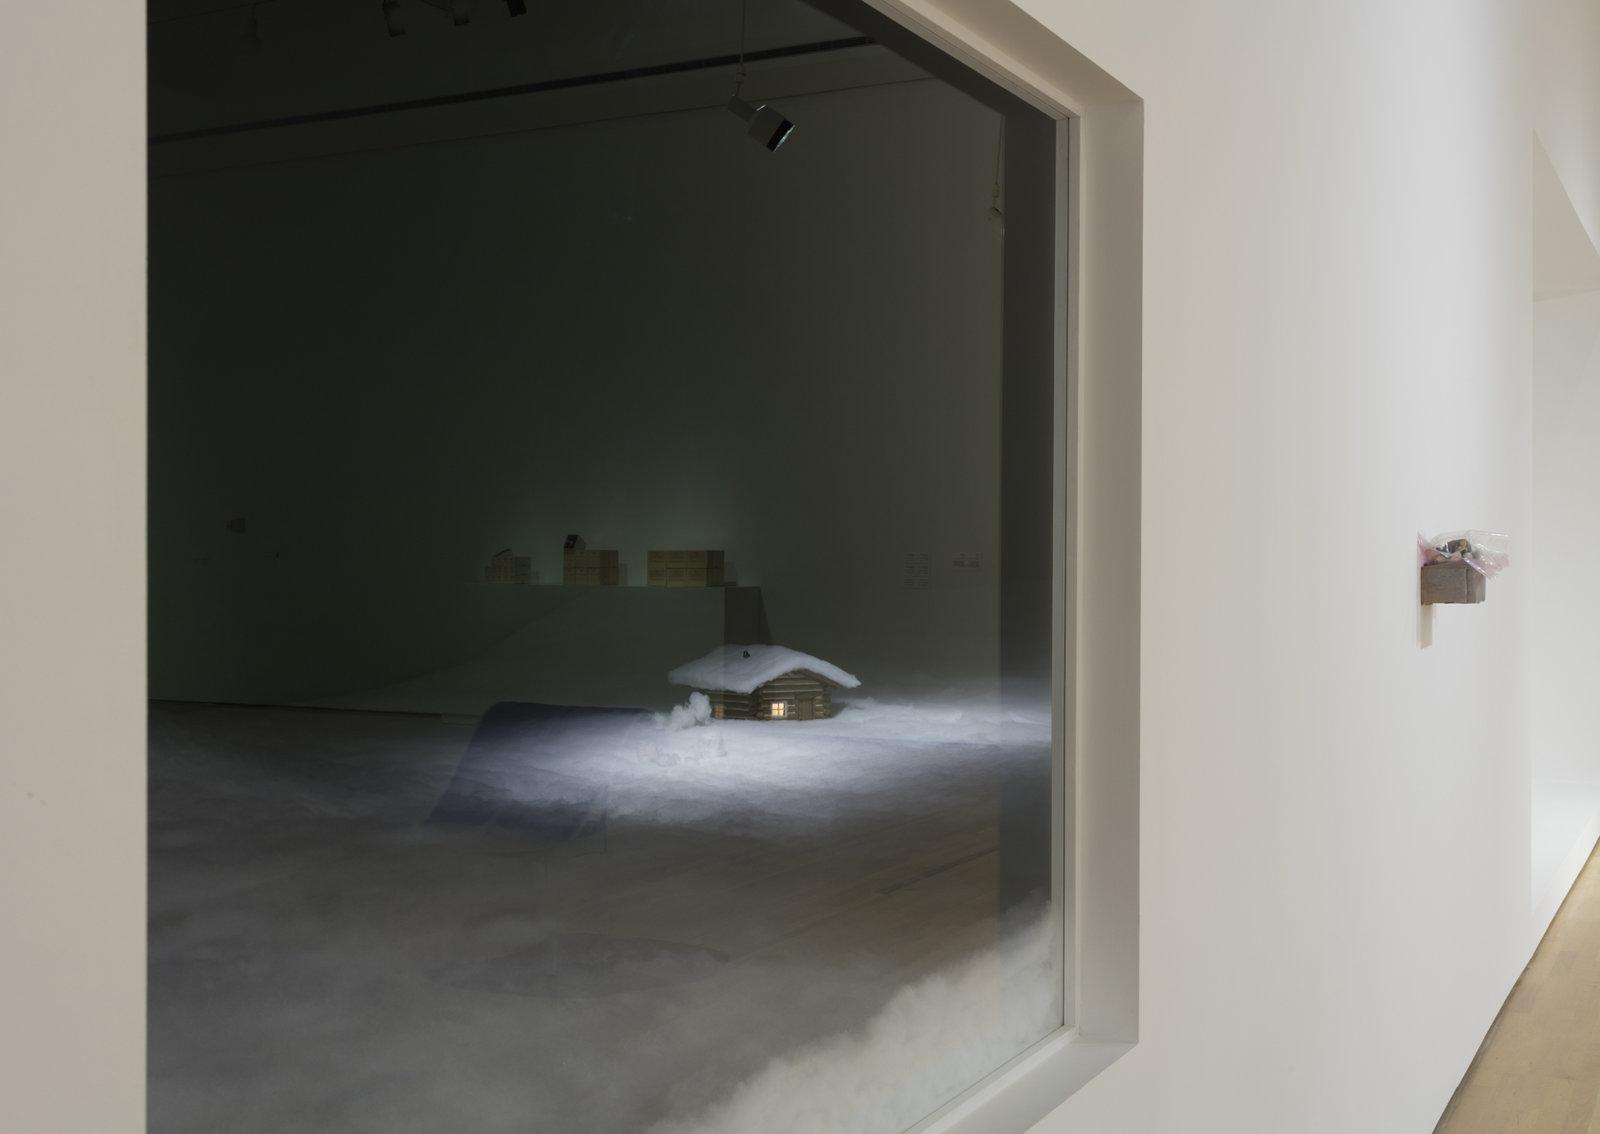 Liz Magor, Cabin in the Snow, 1989, fabric, model log cabin, dimensions variable. Installation view, Habitude, Musée d'art contemporain de Montréal, 2016 by Liz Magor